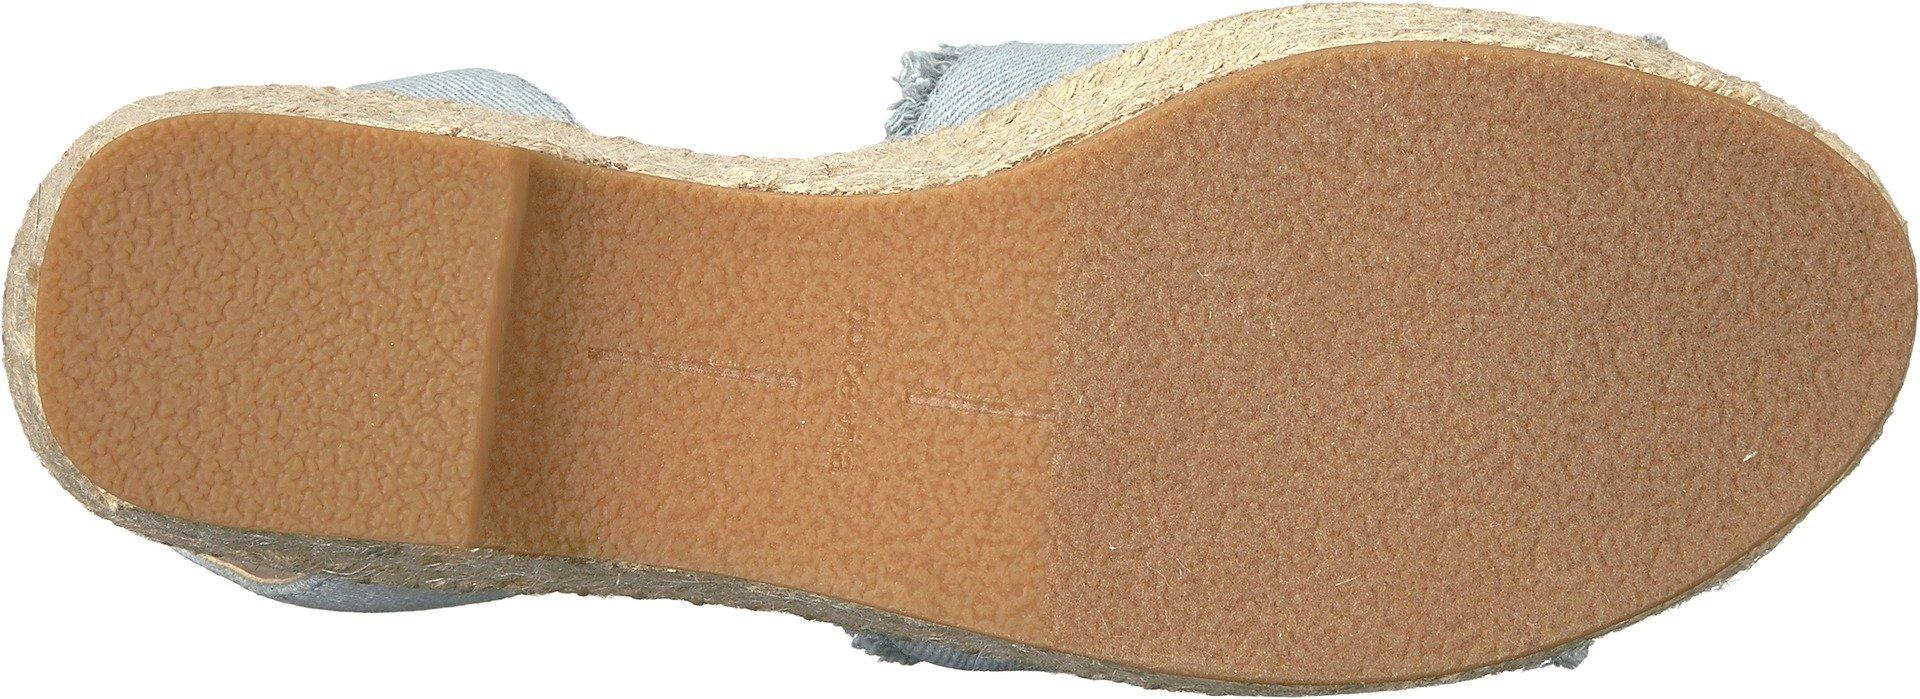 Dolce Vita Women's Lesly Espadrille Wedge Sandal, Light Blue Denim, 7.5 M US by Dolce Vita (Image #3)